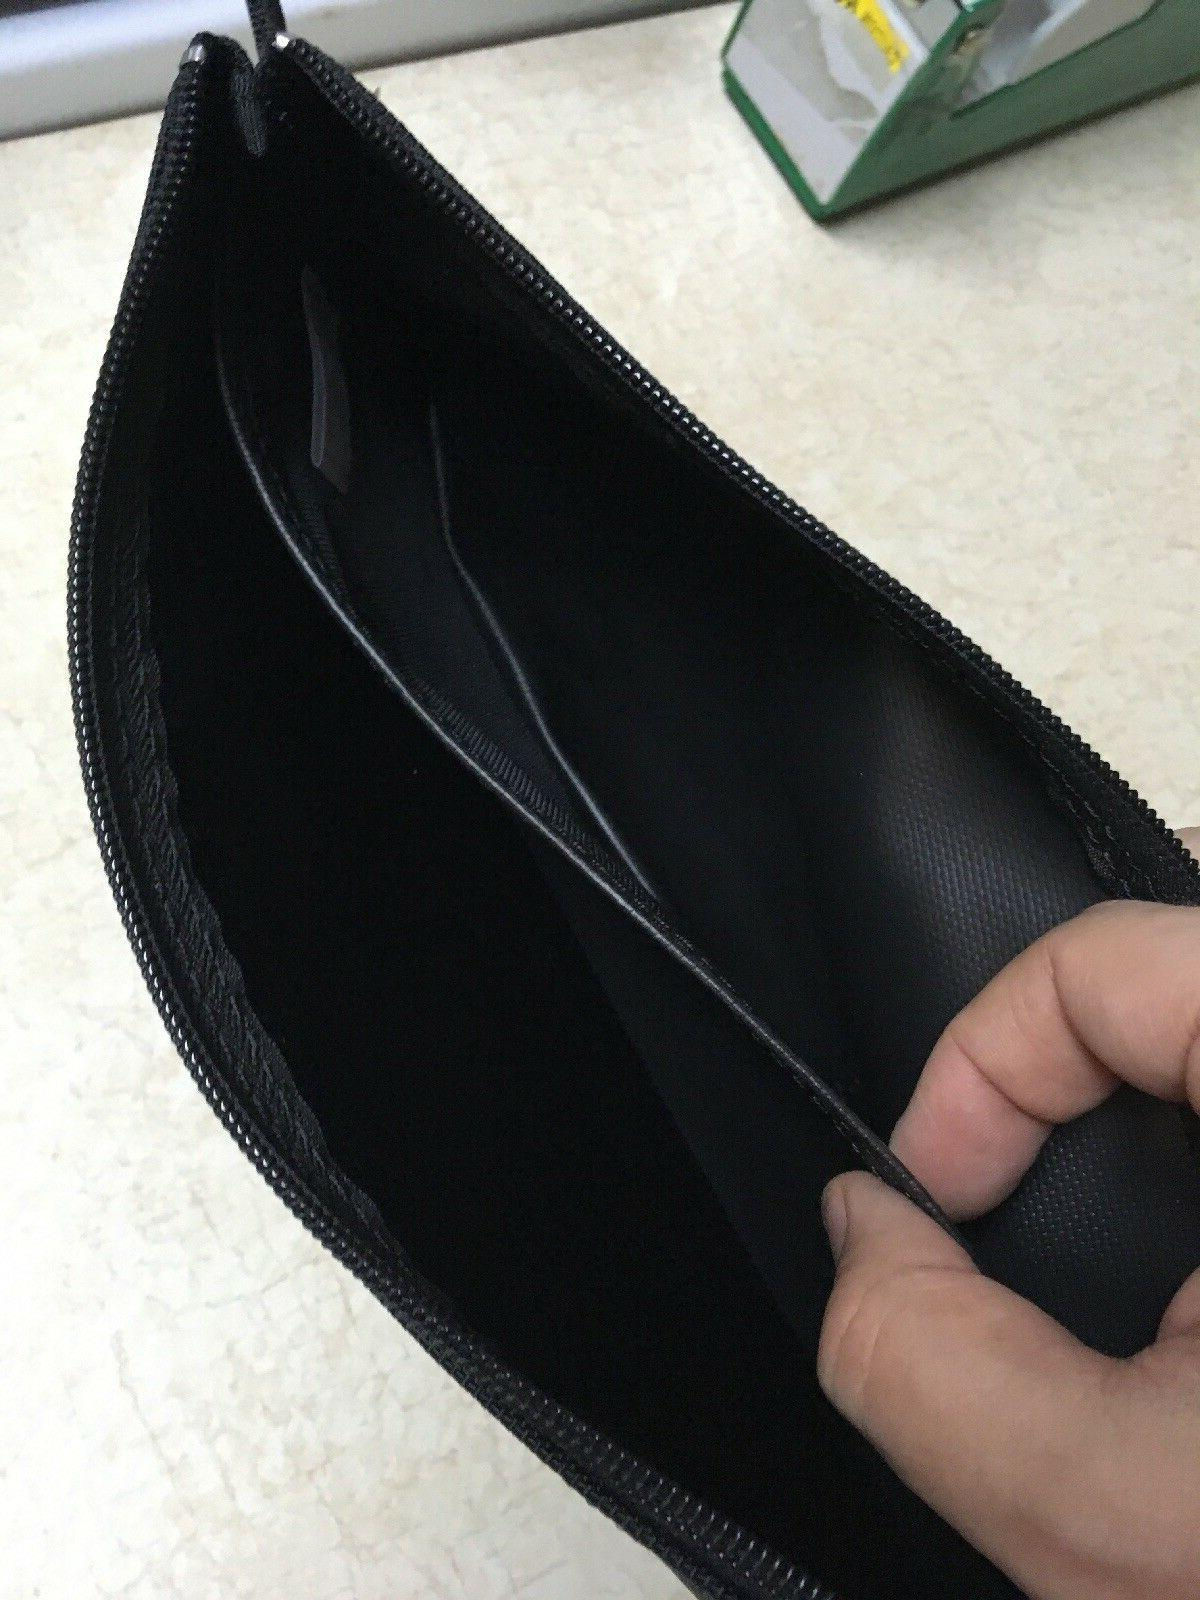 Husky Heavy Duty Money Bag Zipper Resist Tool - inches Pro